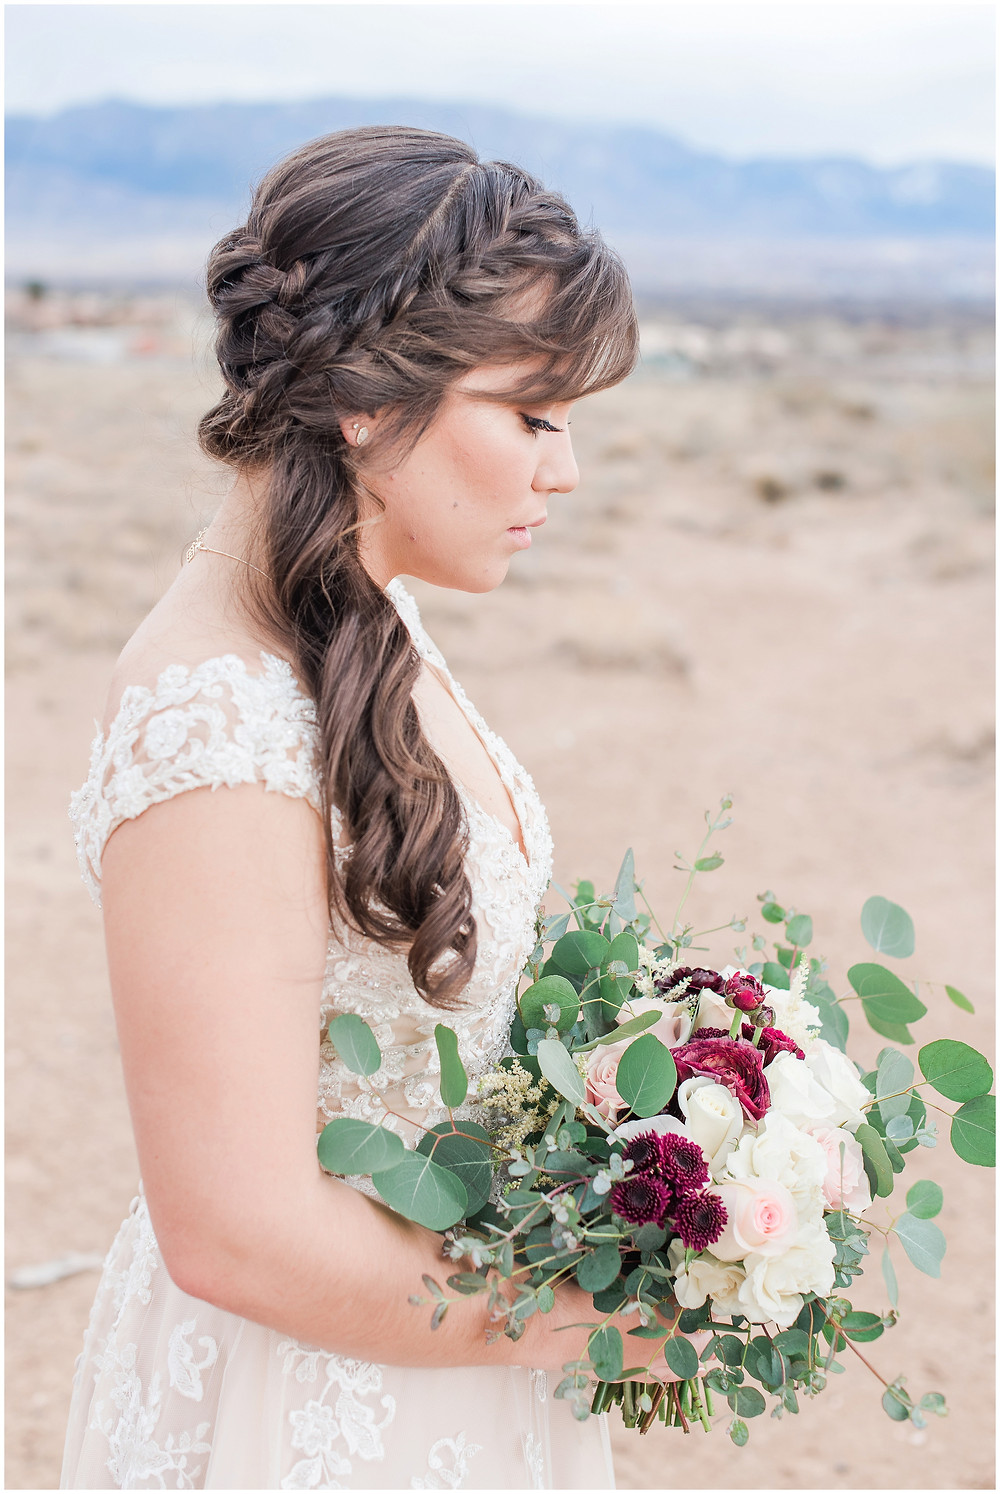 New Mexico wedding photographer. Albuquerque wedding photographer. Noahs event venue wedding. Pink and burgundy wedding. outdoor wedding portraits. bridal portraits. bridal hair and makeup. wedding hair wedding make up